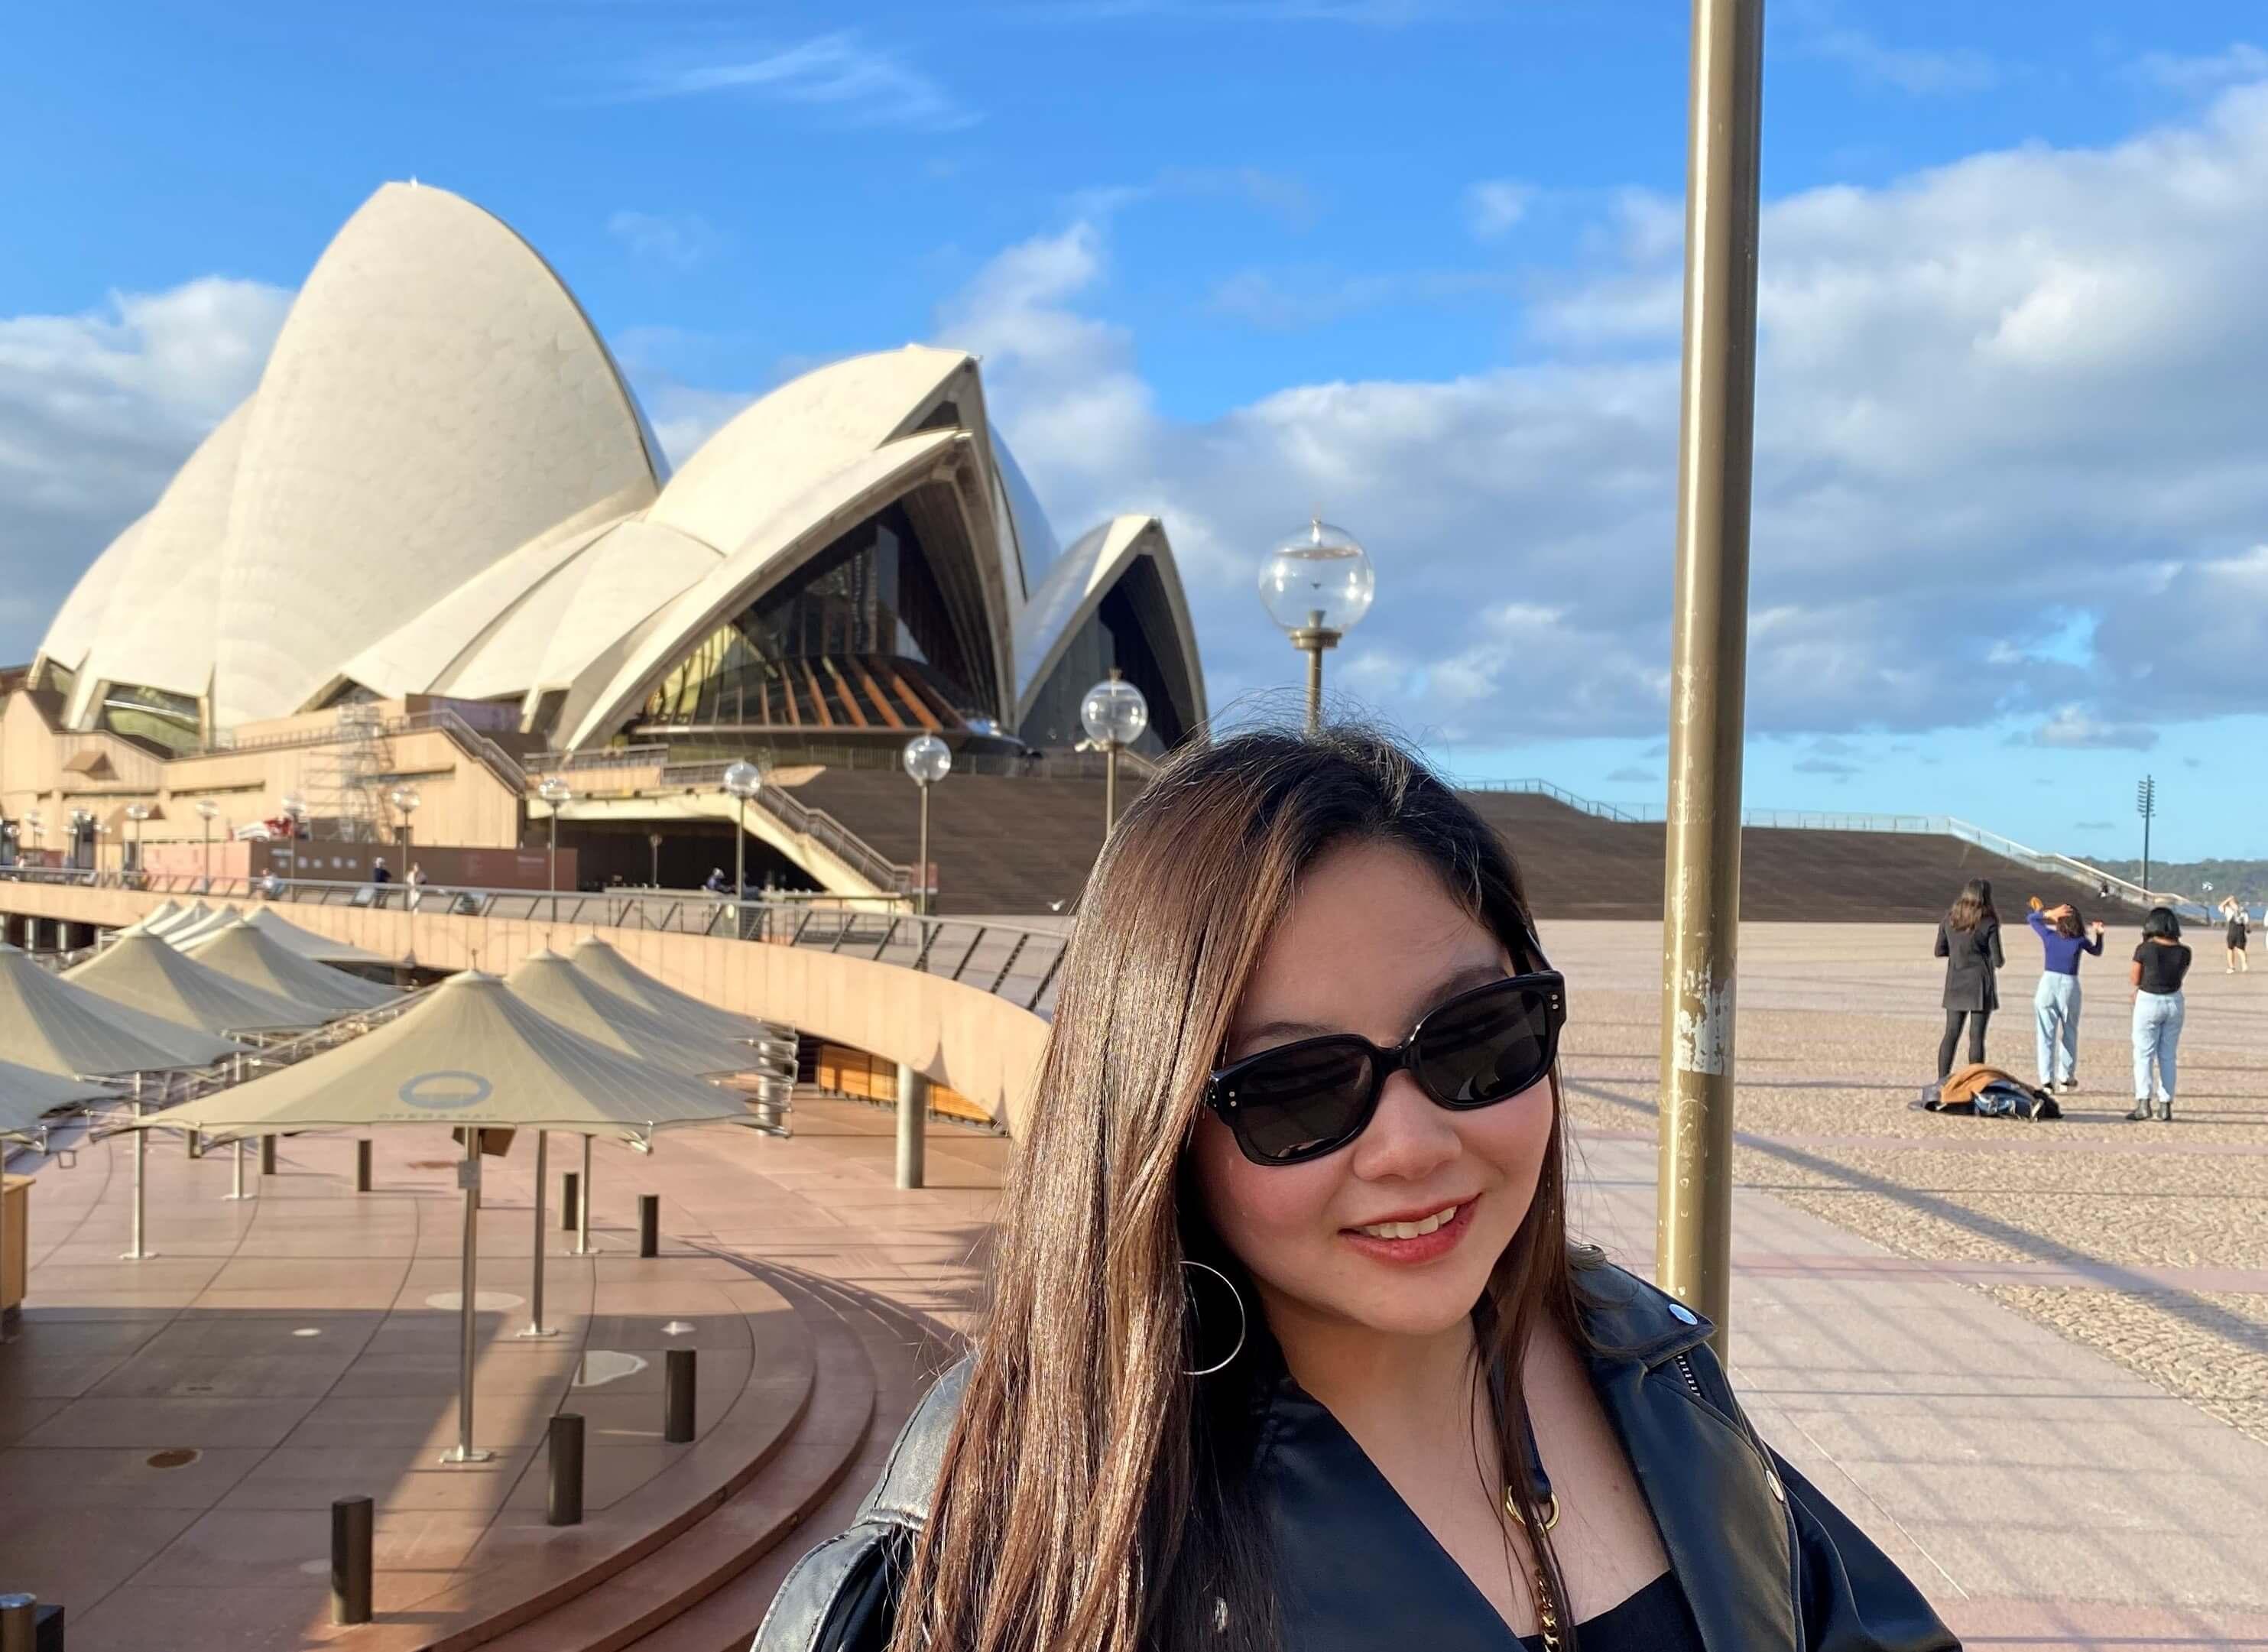 How Australia's hard borders crushed an international student's dreams